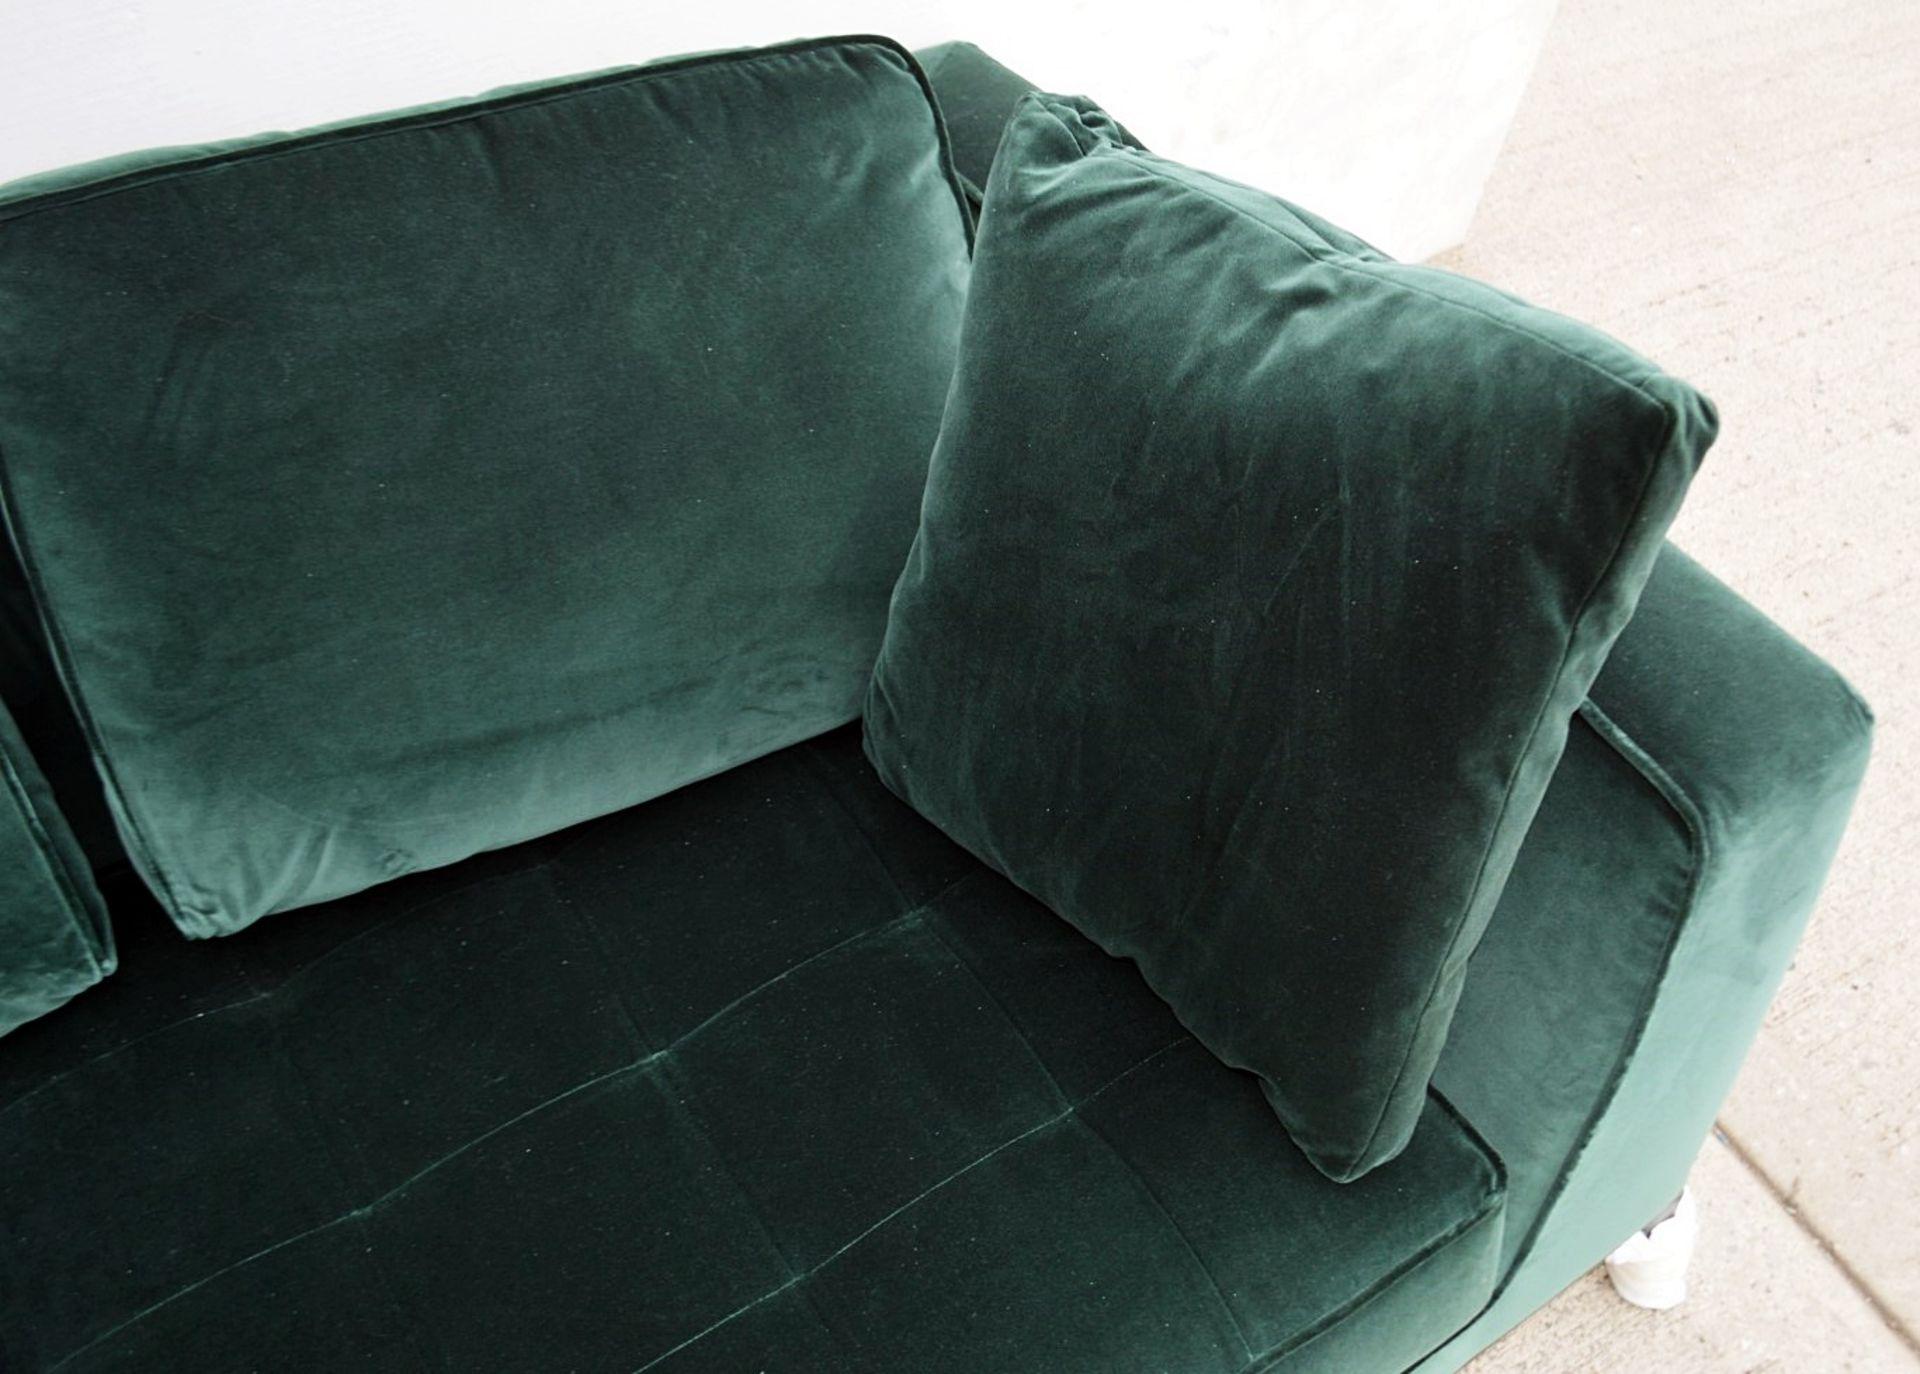 2 x B&B Italia MAXALTO Luxury Sofa Sections Both Upholstered In Rich Dark Green Velvet - RRP £7,248 - Image 2 of 13